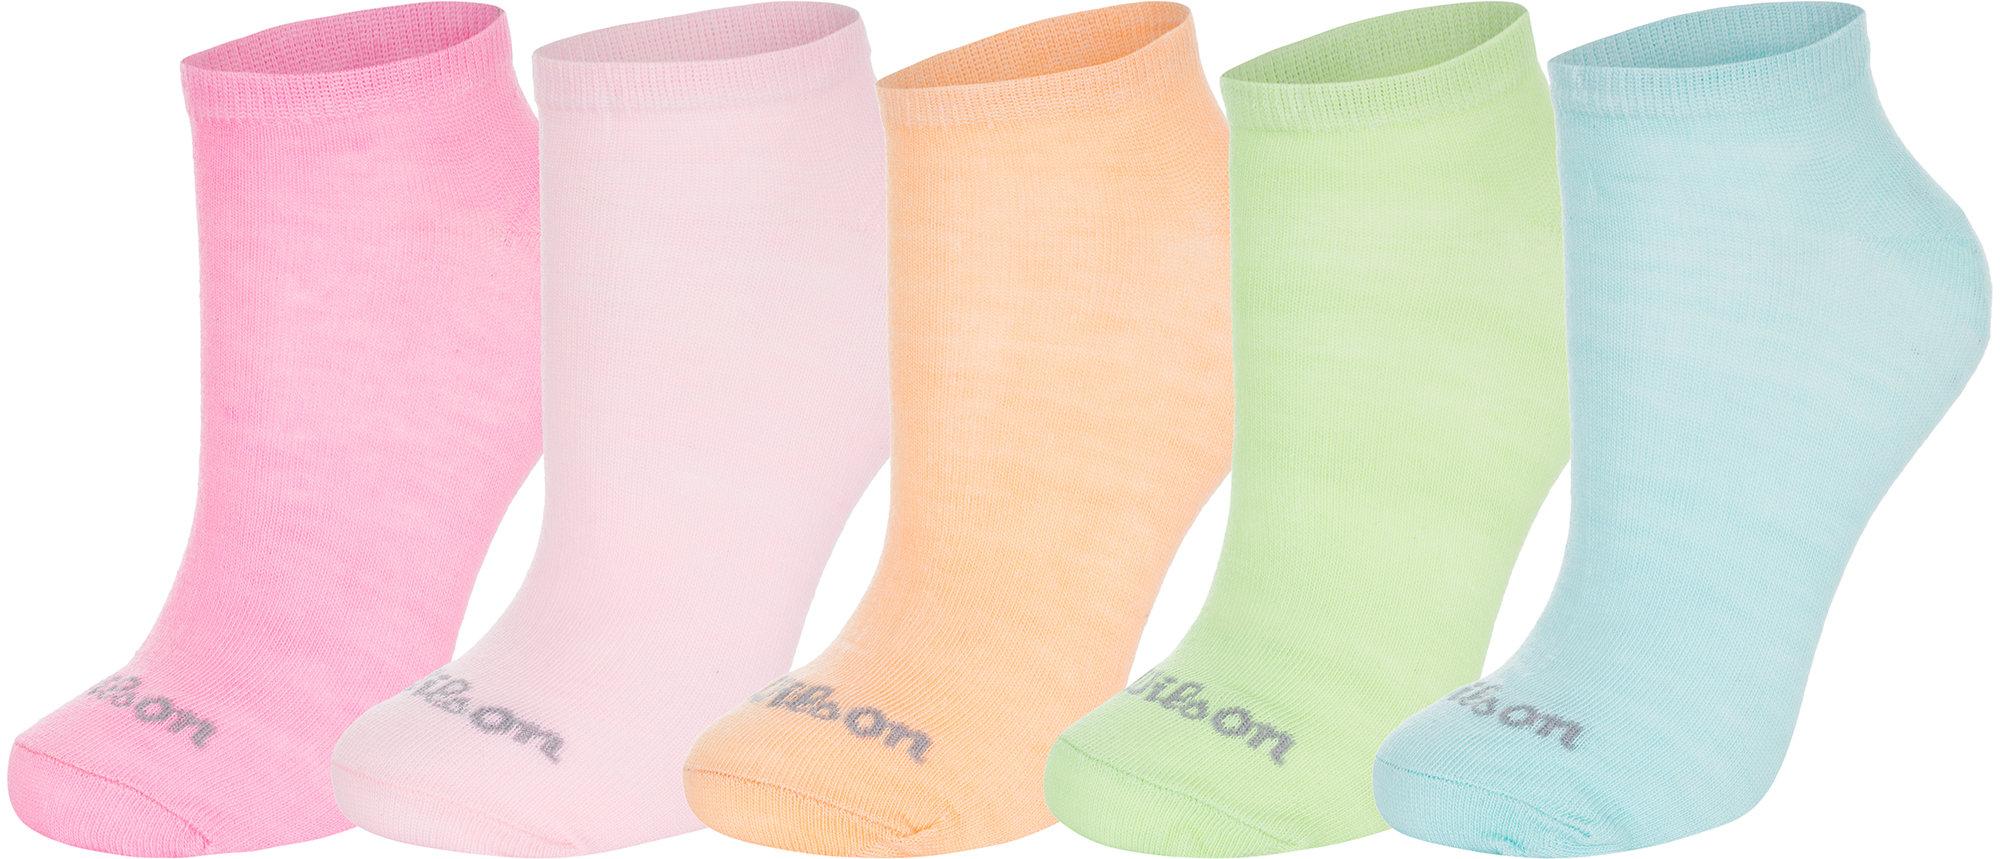 Носки женские Wilson Solids, 5 пар